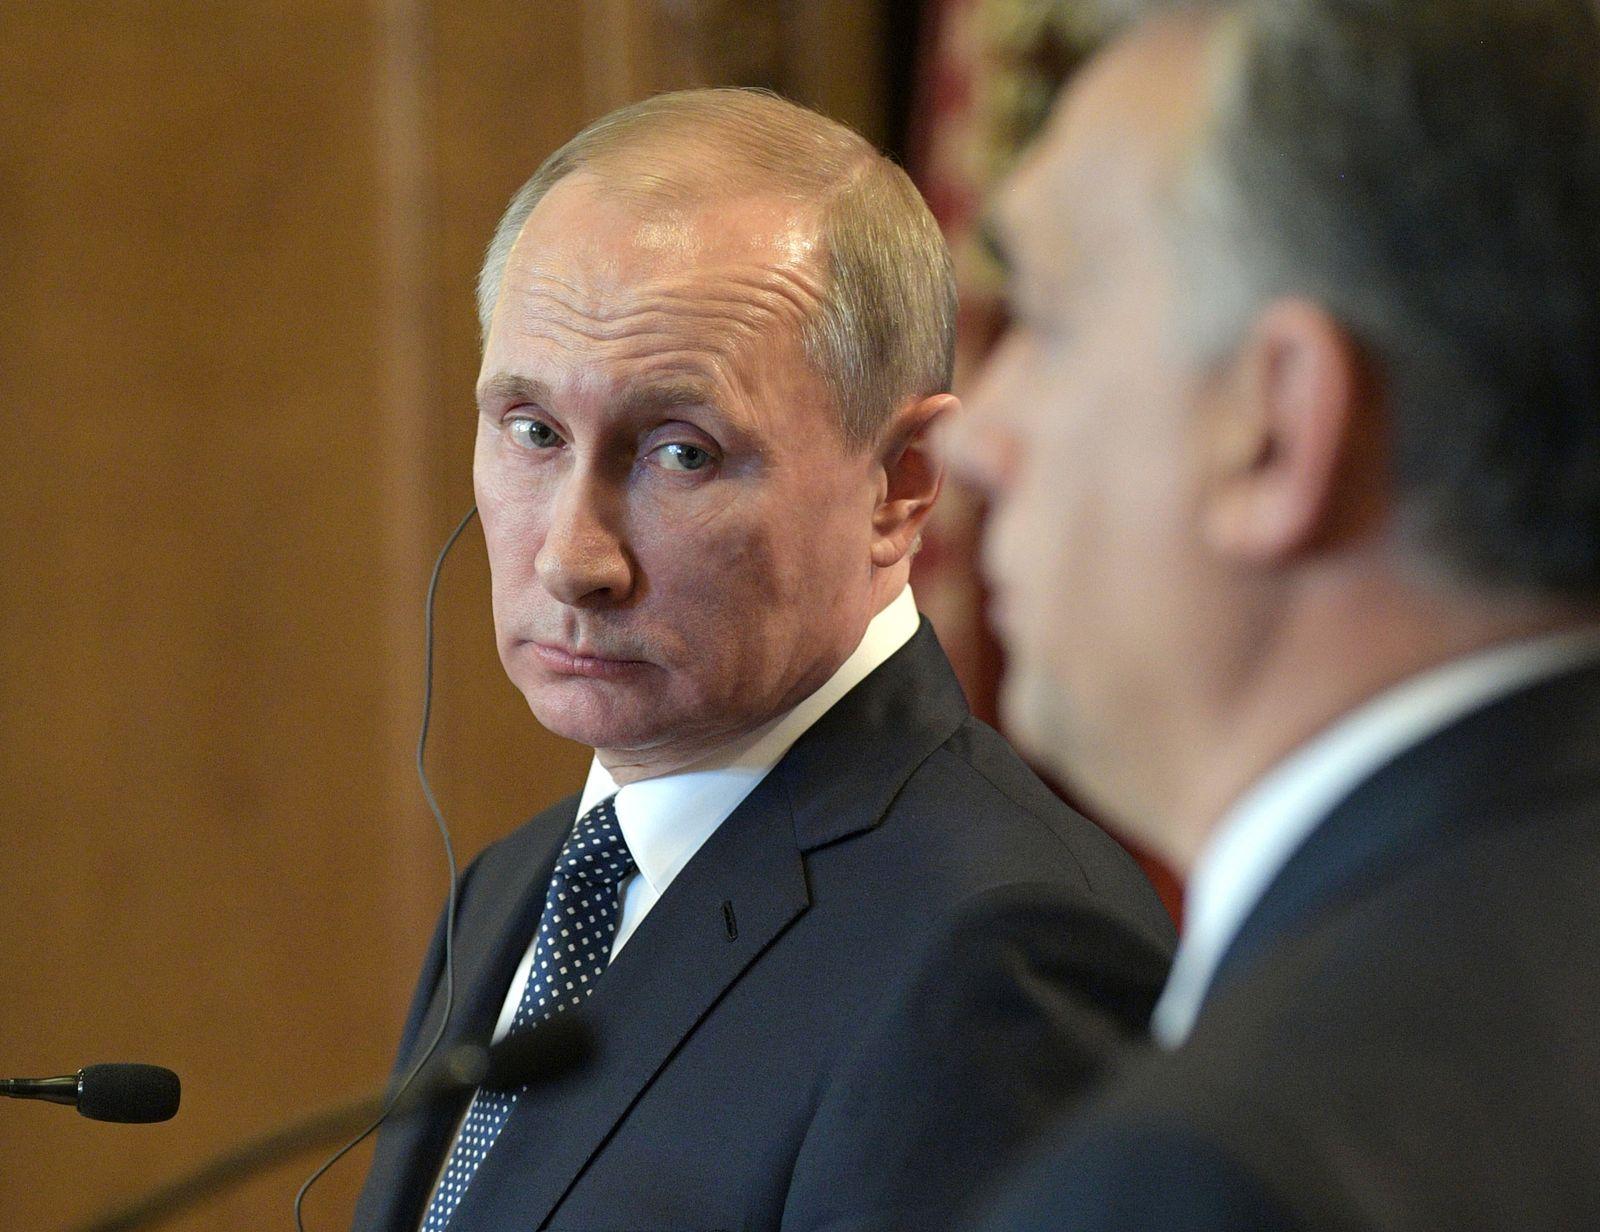 Wladimir Putin / Viktor Orban